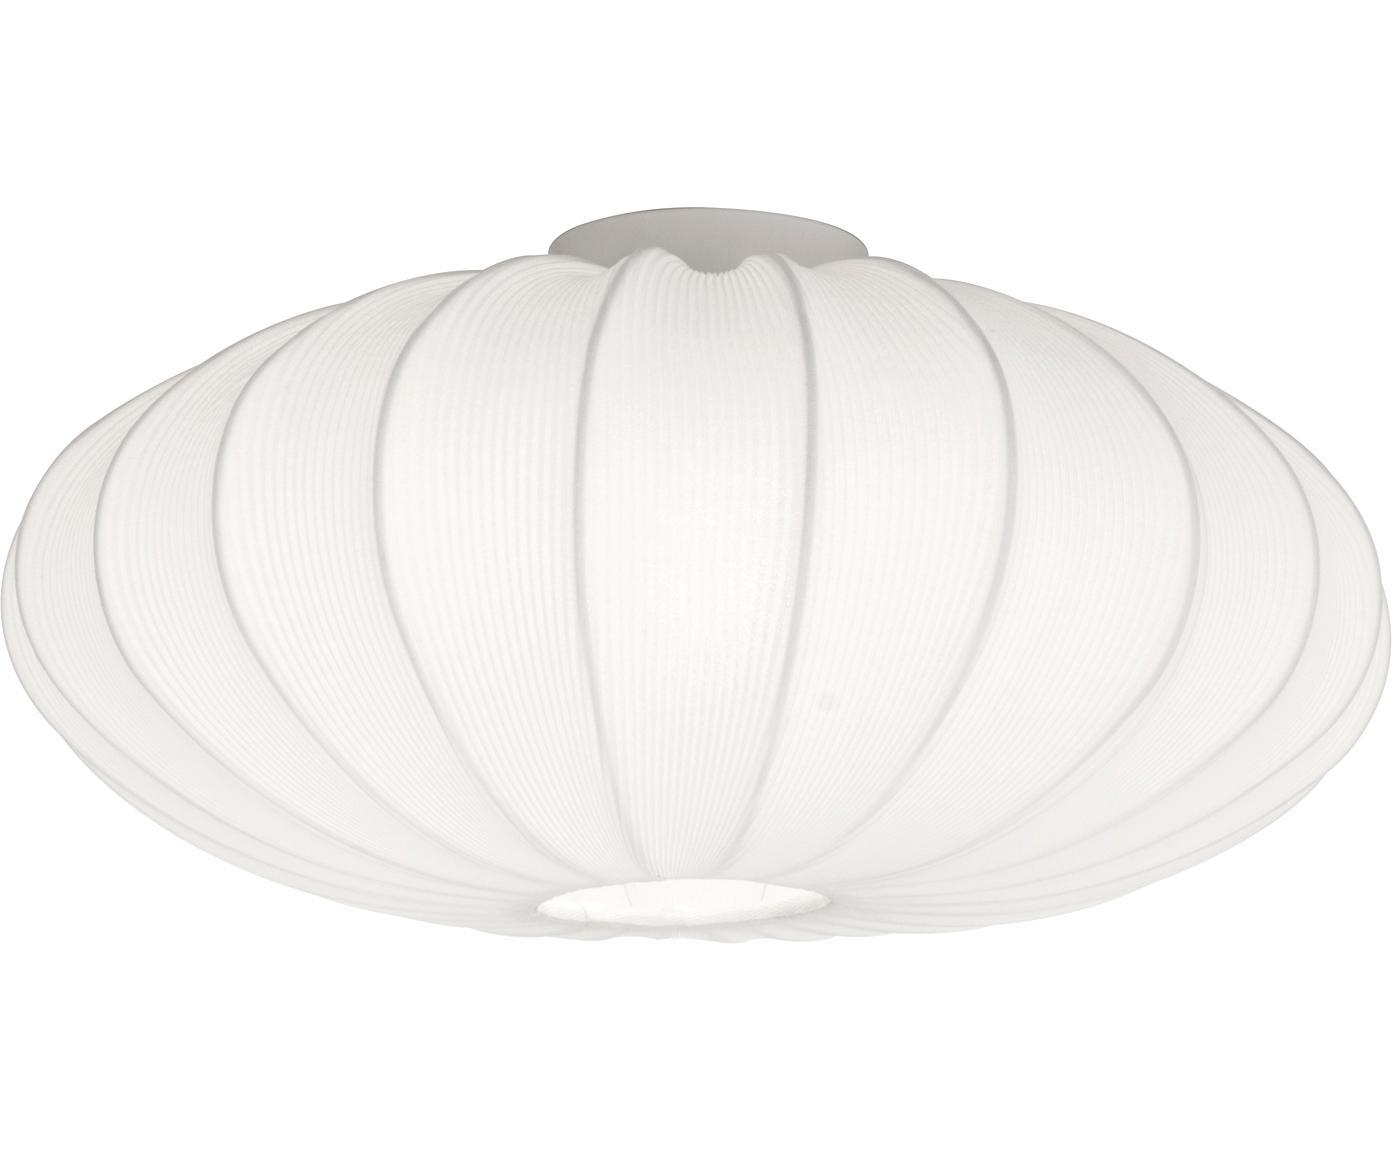 Plafondlamp Mamsell, Metaal, textiel, Wit, Ø 55 x H 28 cm